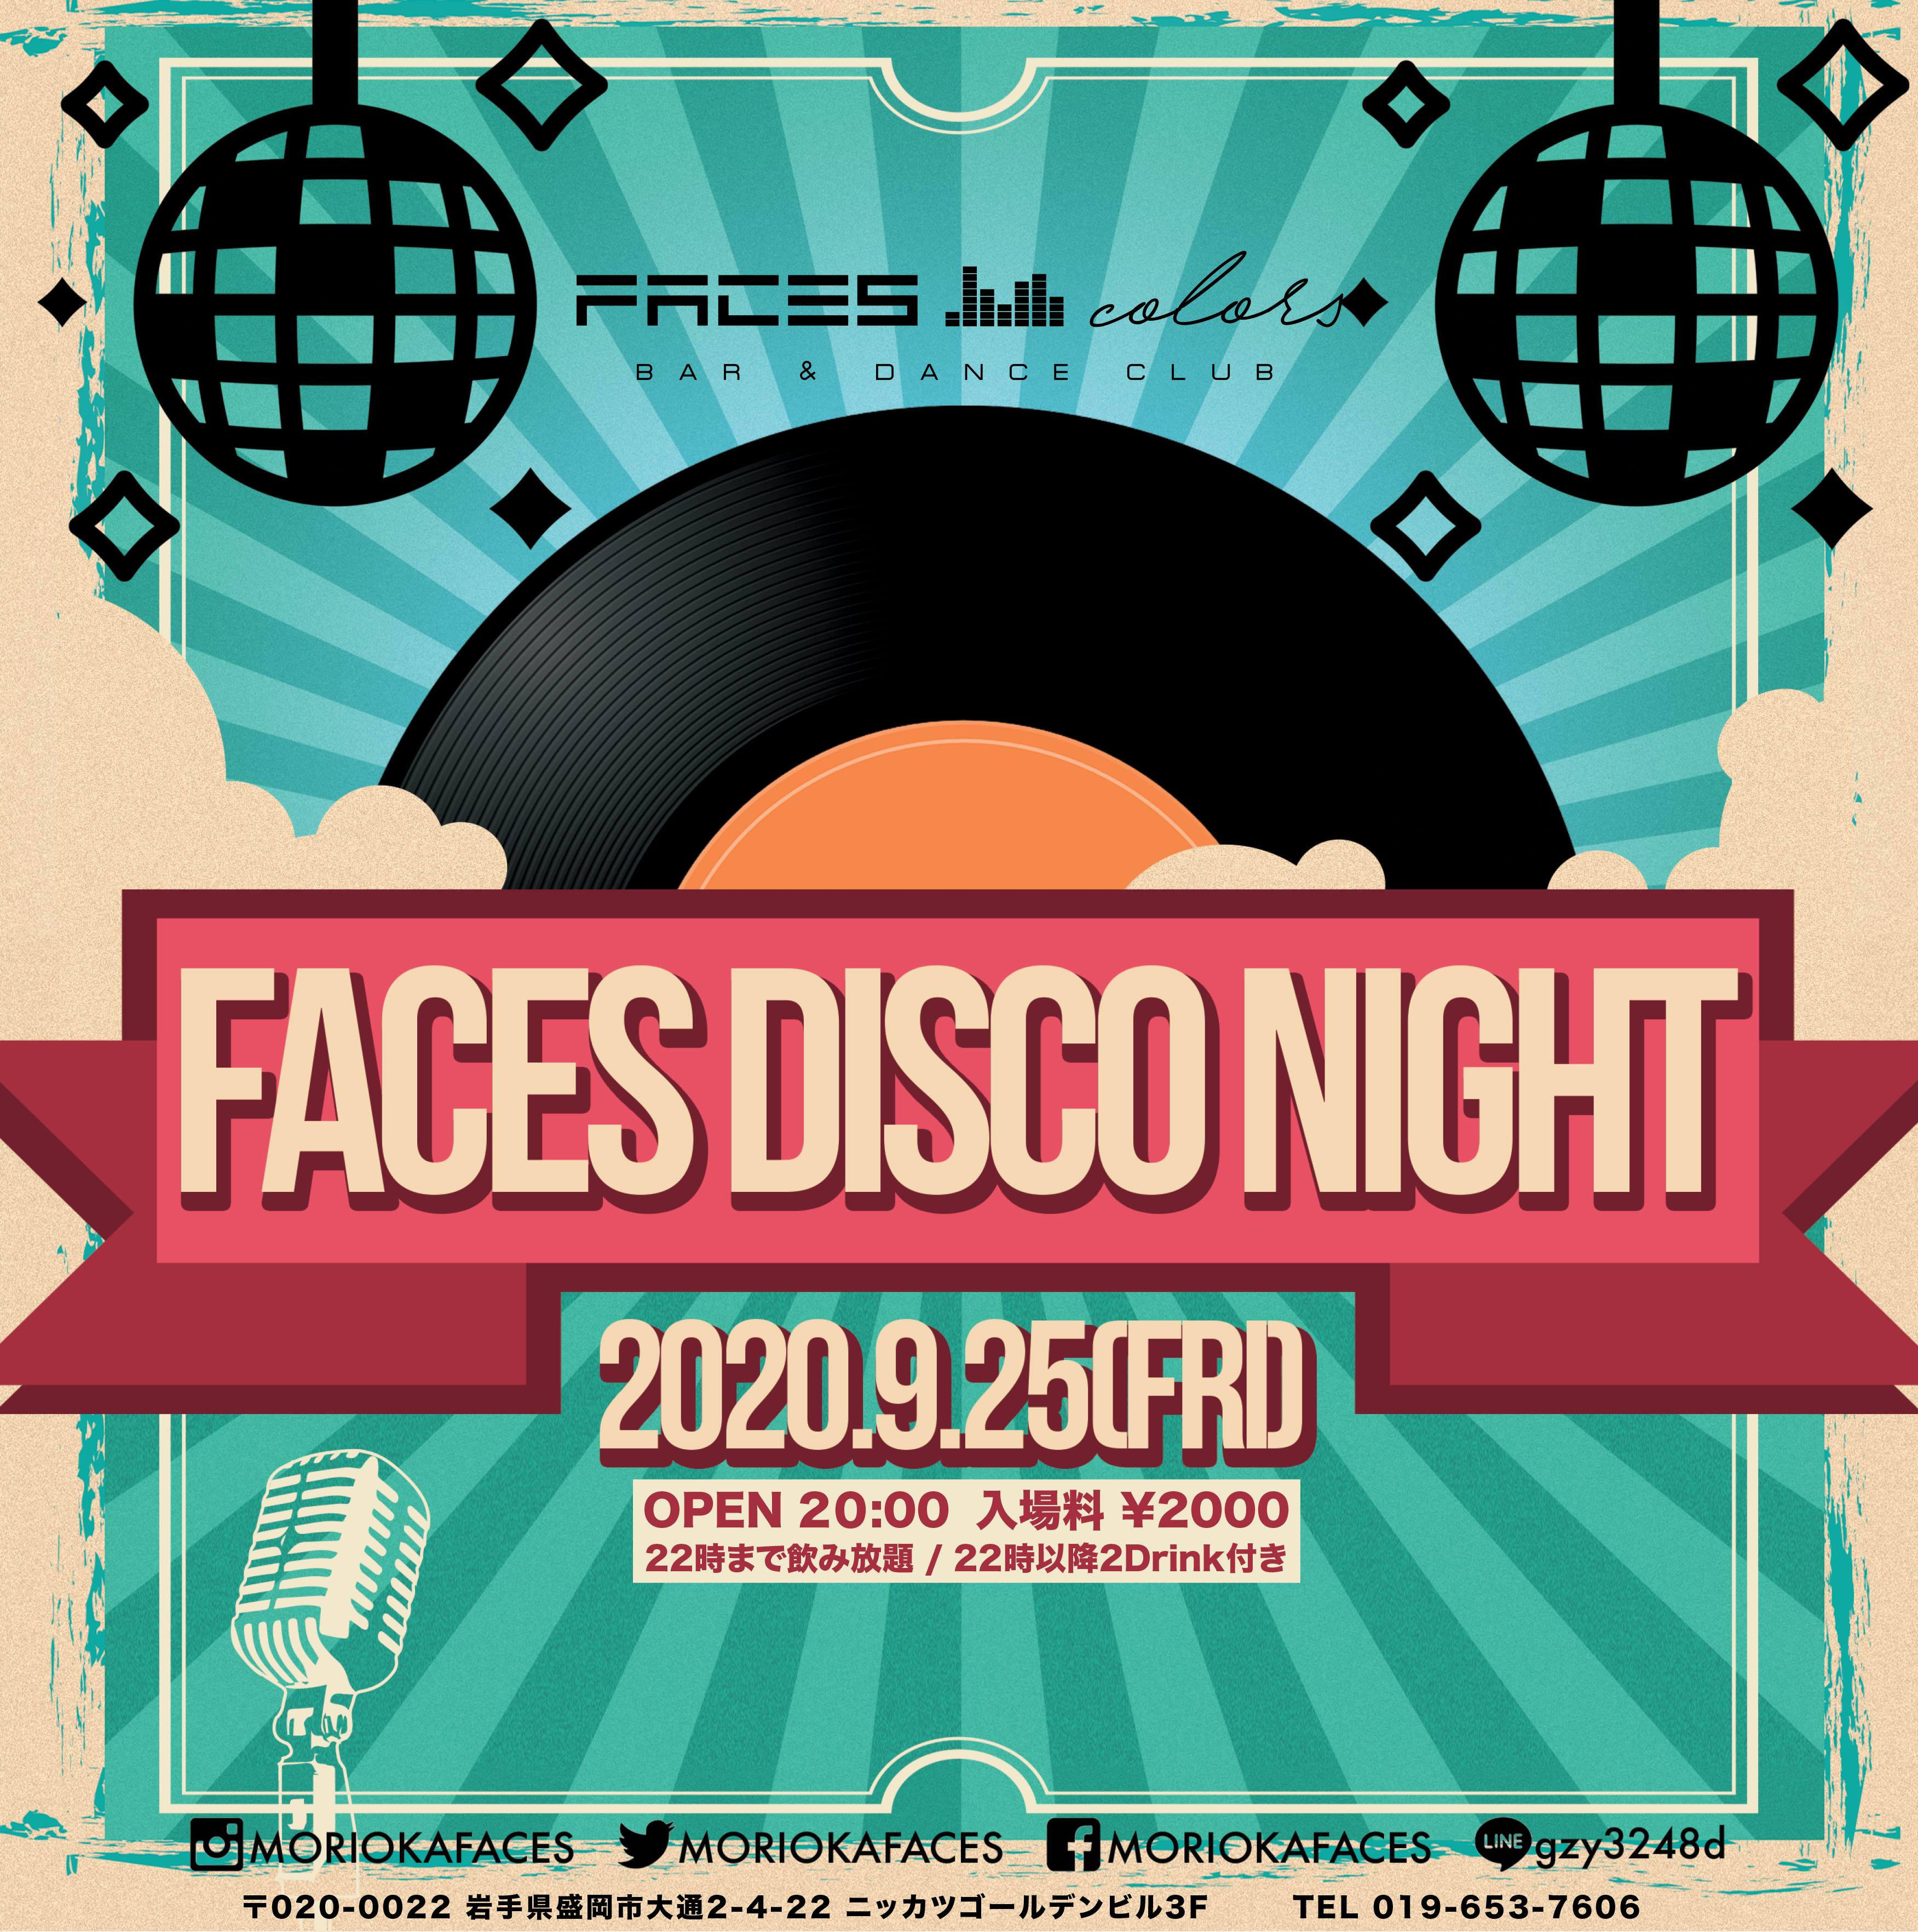 9.25(FRI) FACES DISCO NIGHT